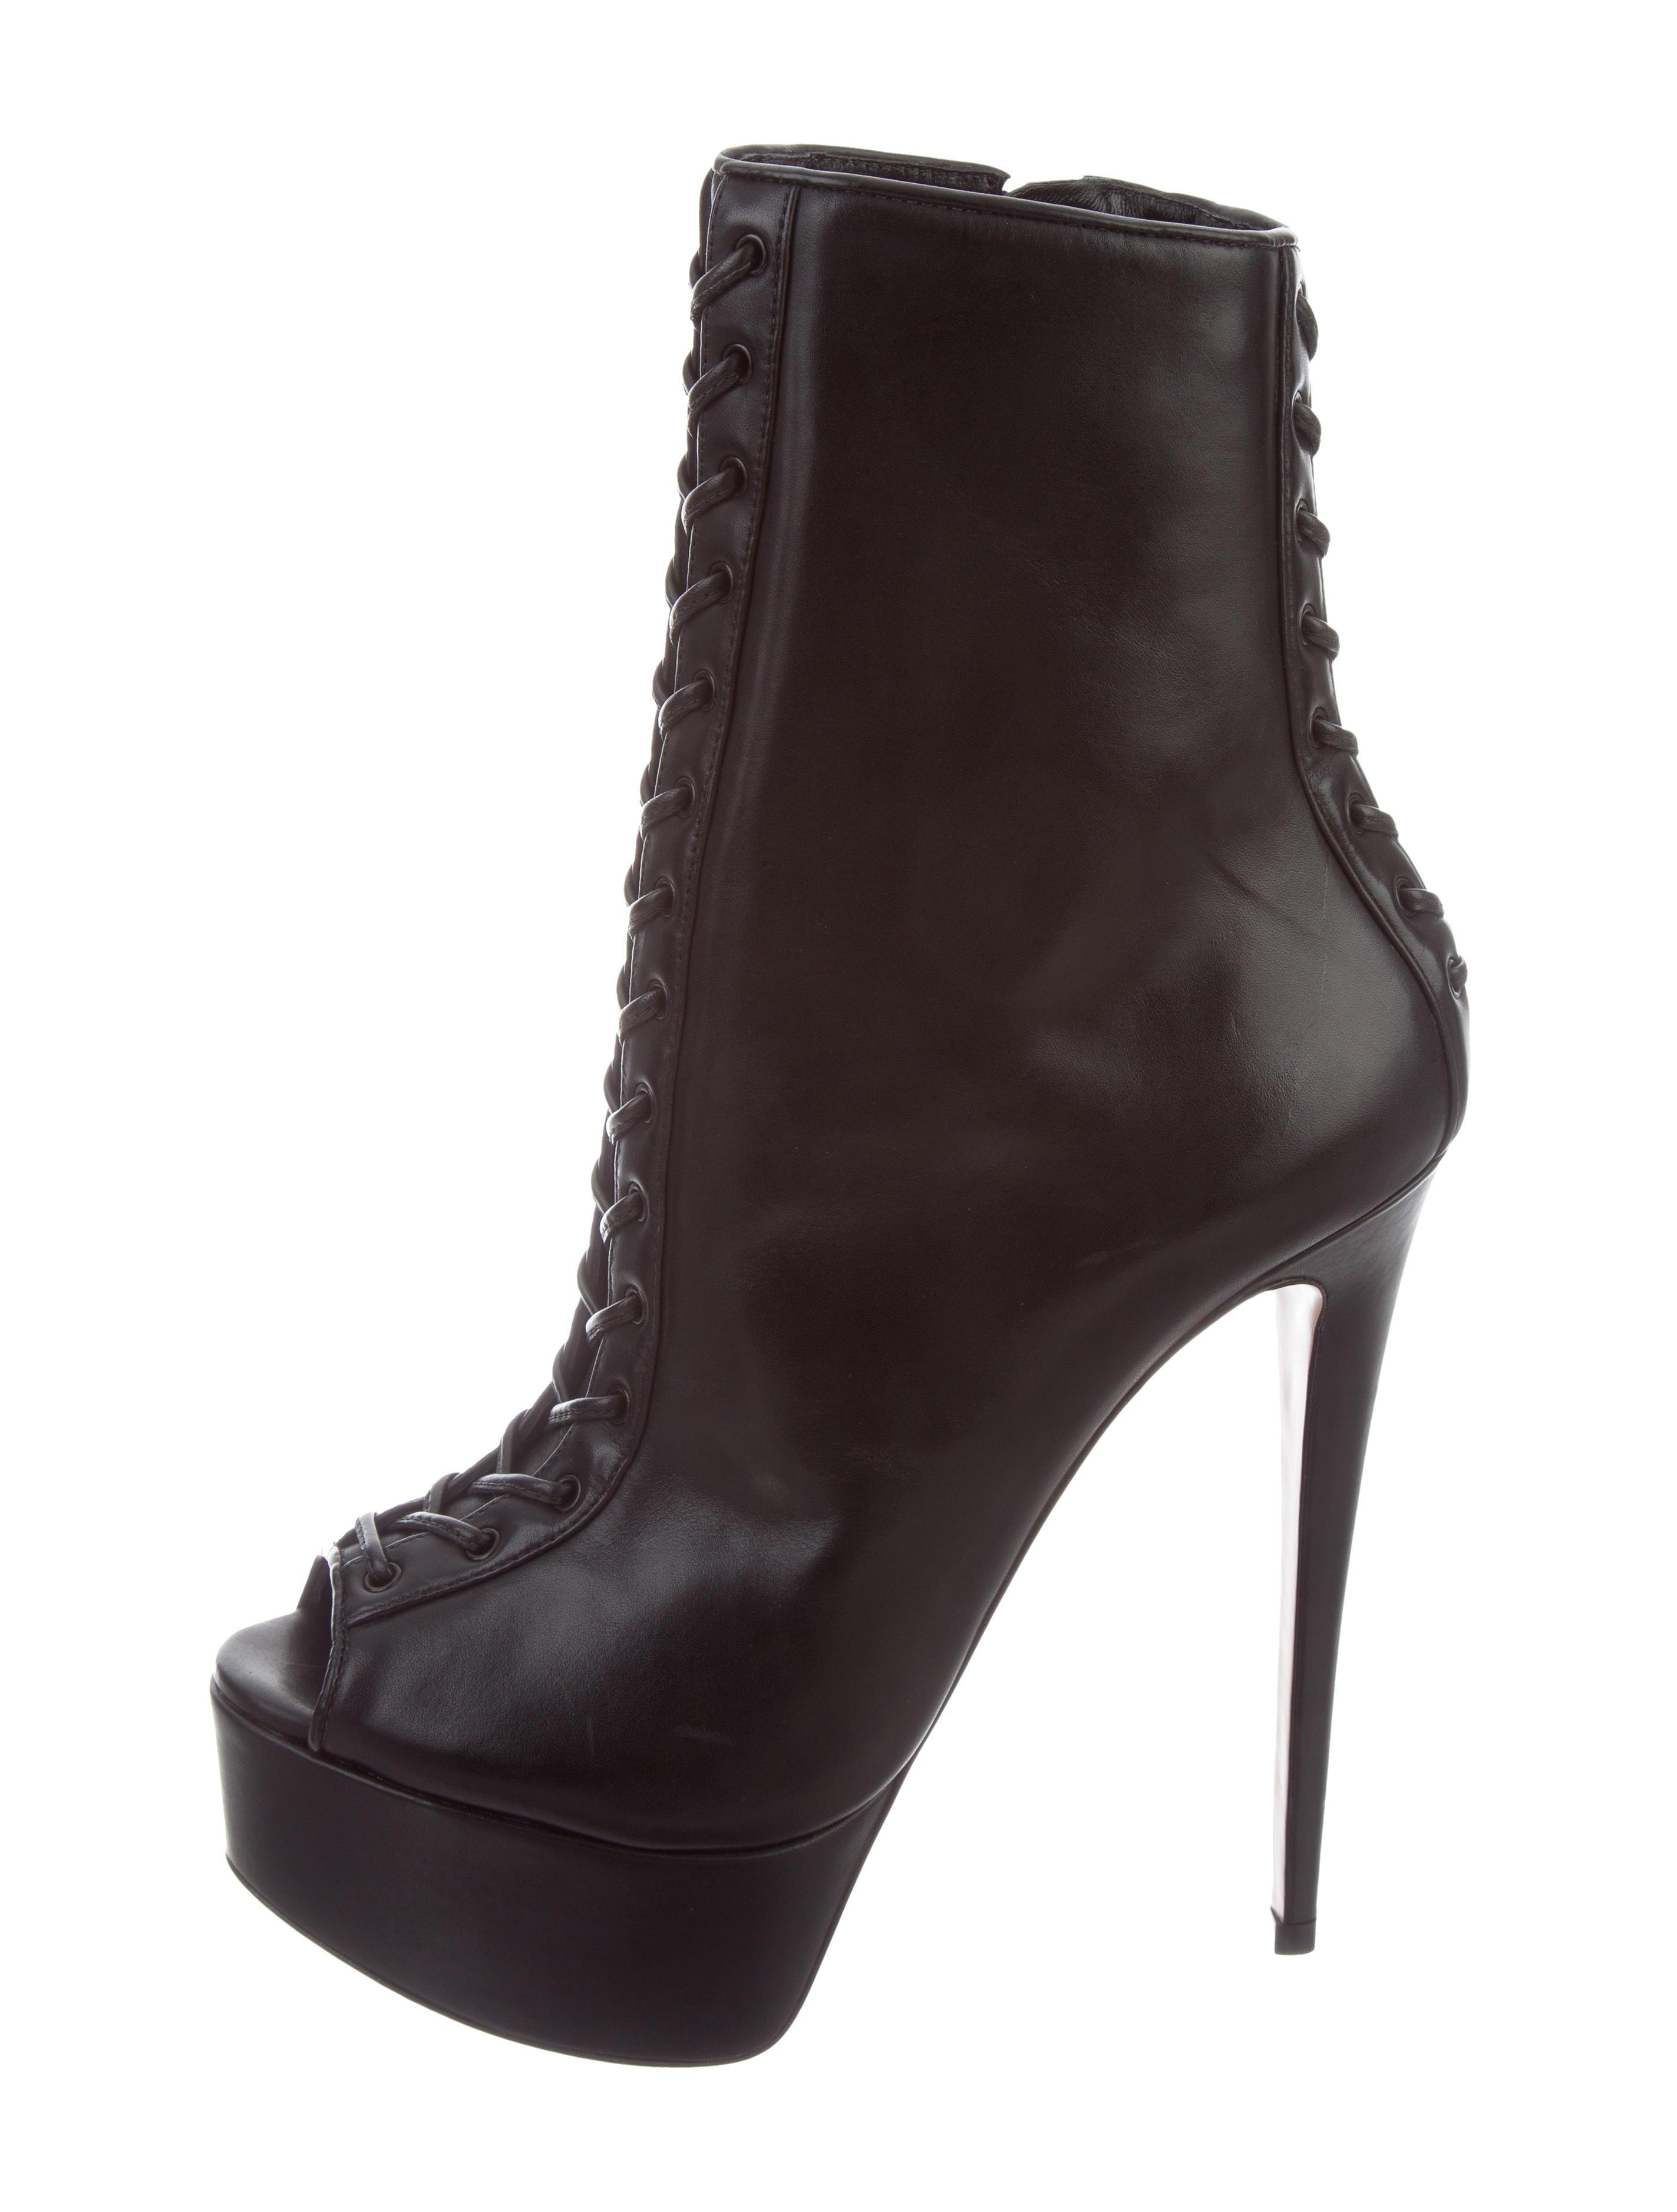 for sale official site Ruthie Davis Cara Platform Boots w/ Tags 100% authentic online limited edition online cheap sale discount excellent sale online GNv0DBG